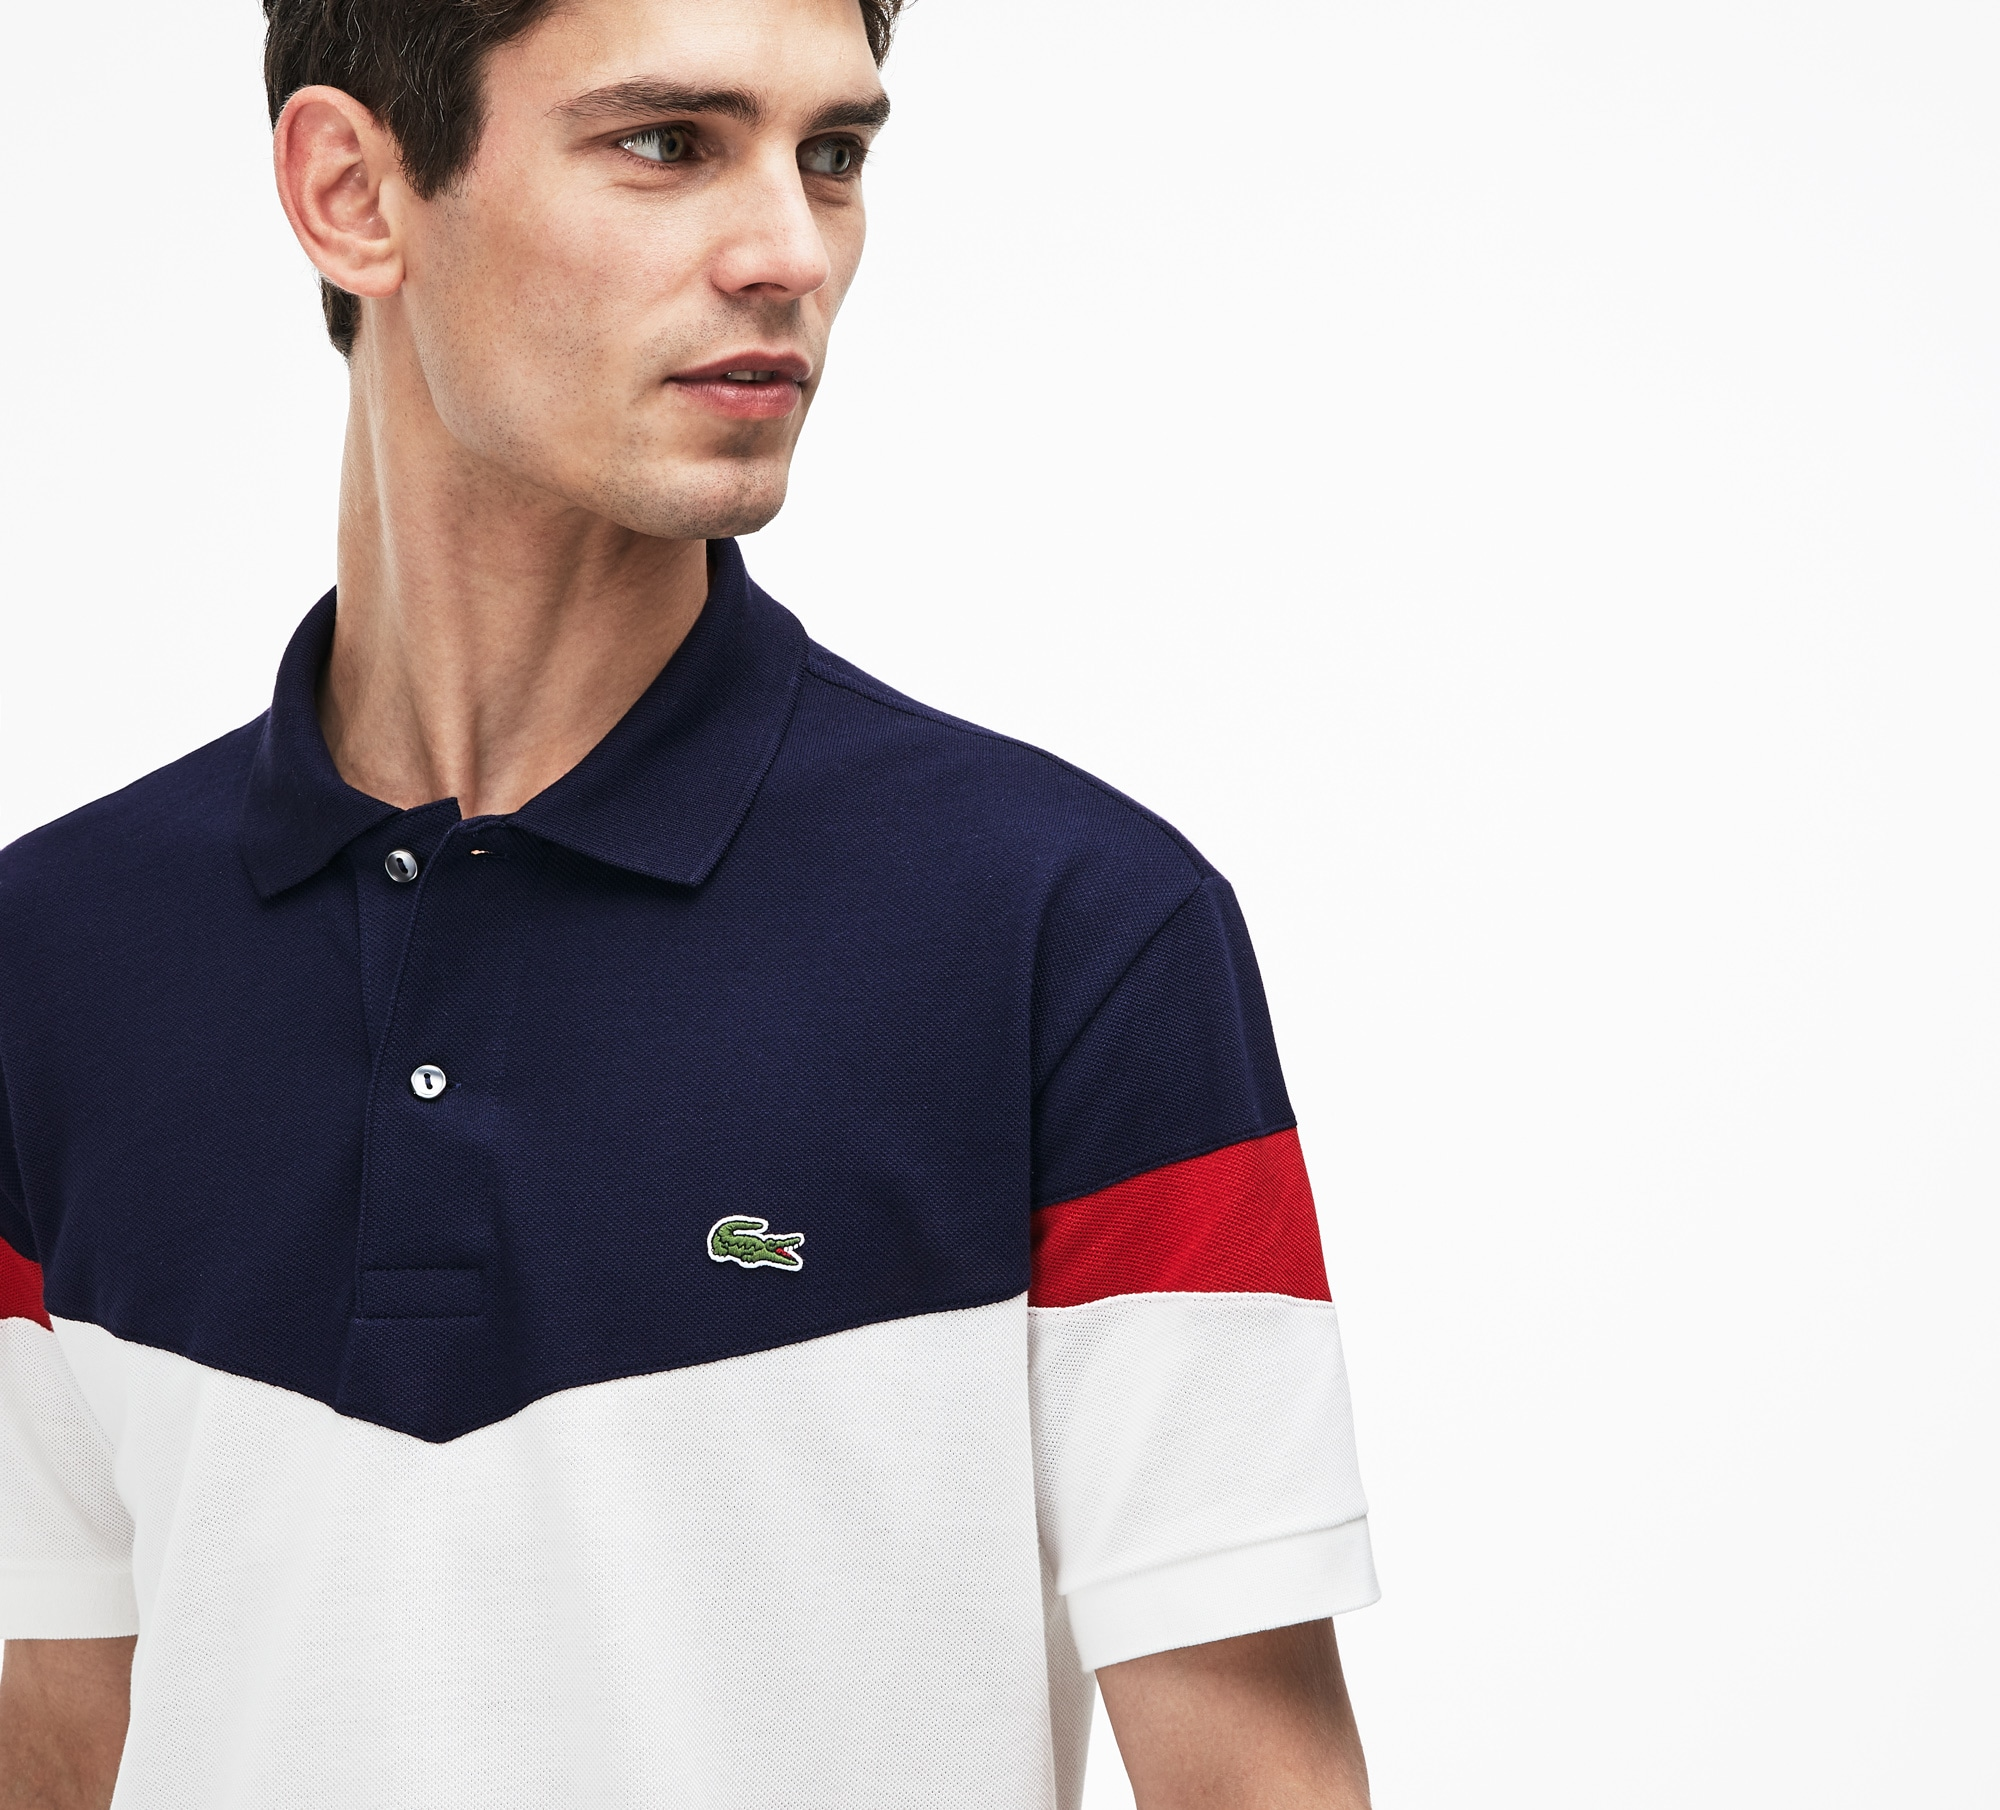 Herren LACOSTE Slim Fit Poloshirt aus Baumwoll-Petit-Piqué